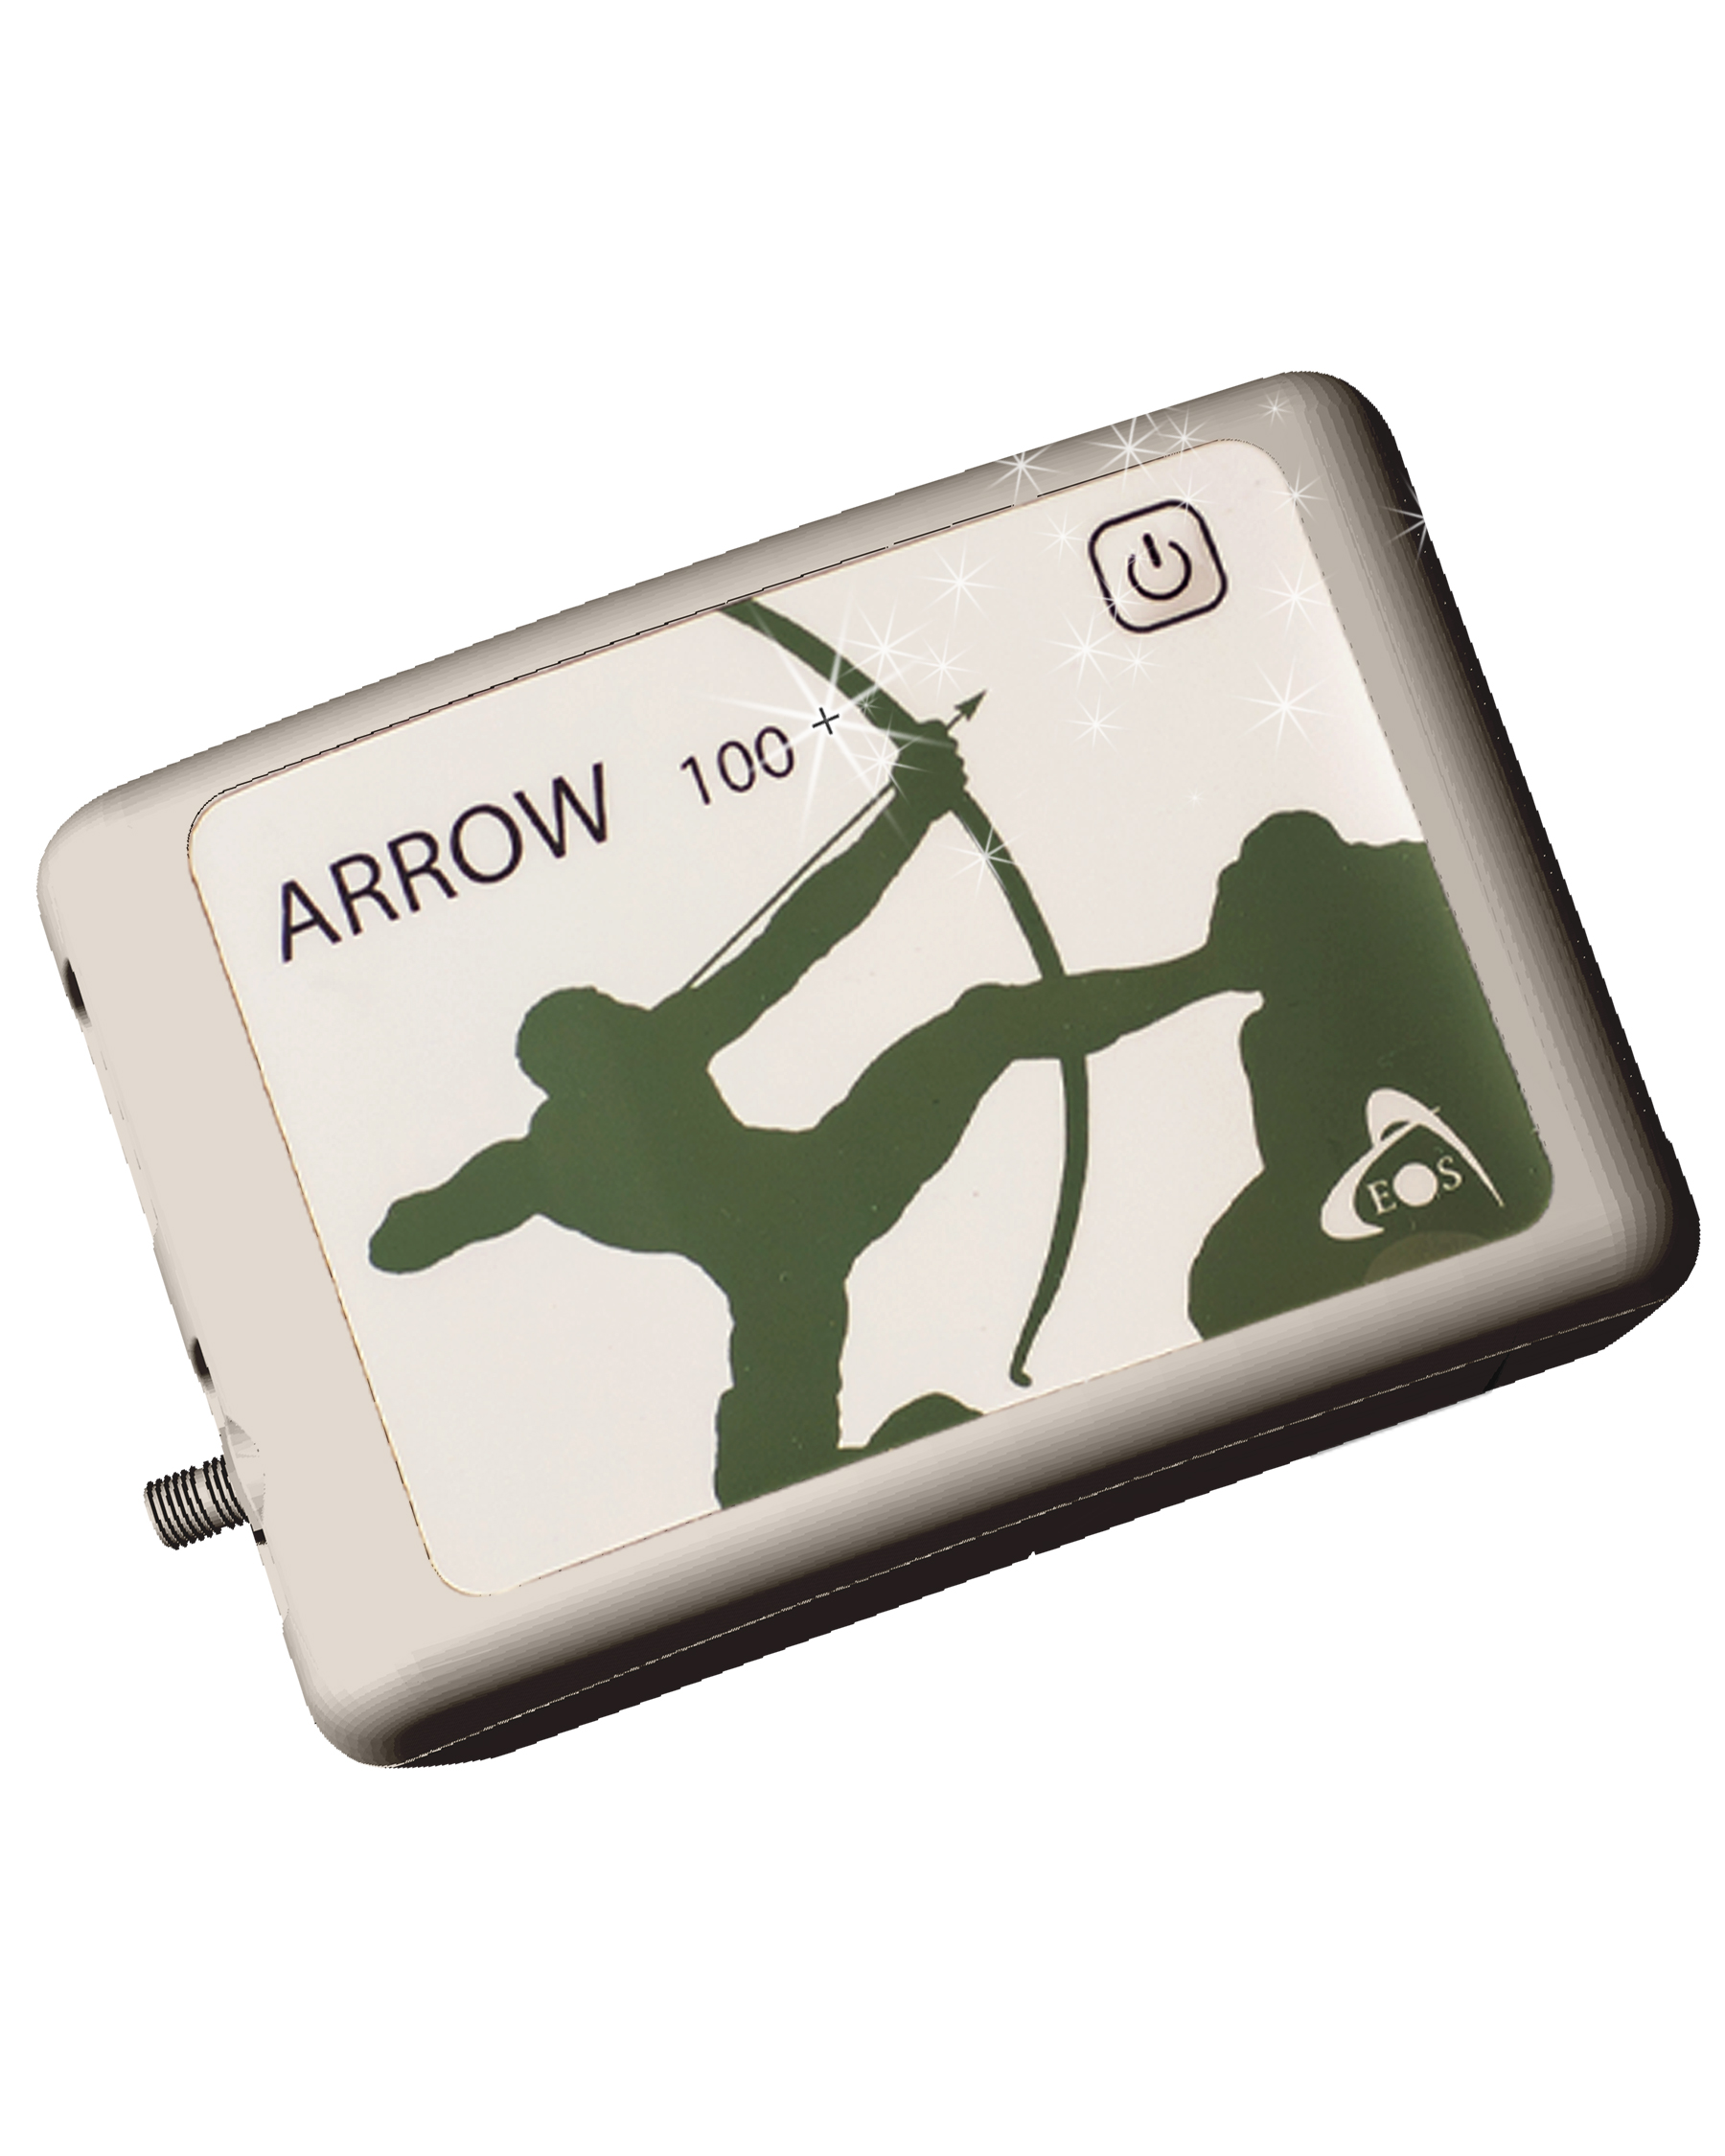 Eos Arrow 100 Plus GNSS Receiver GIS GPS